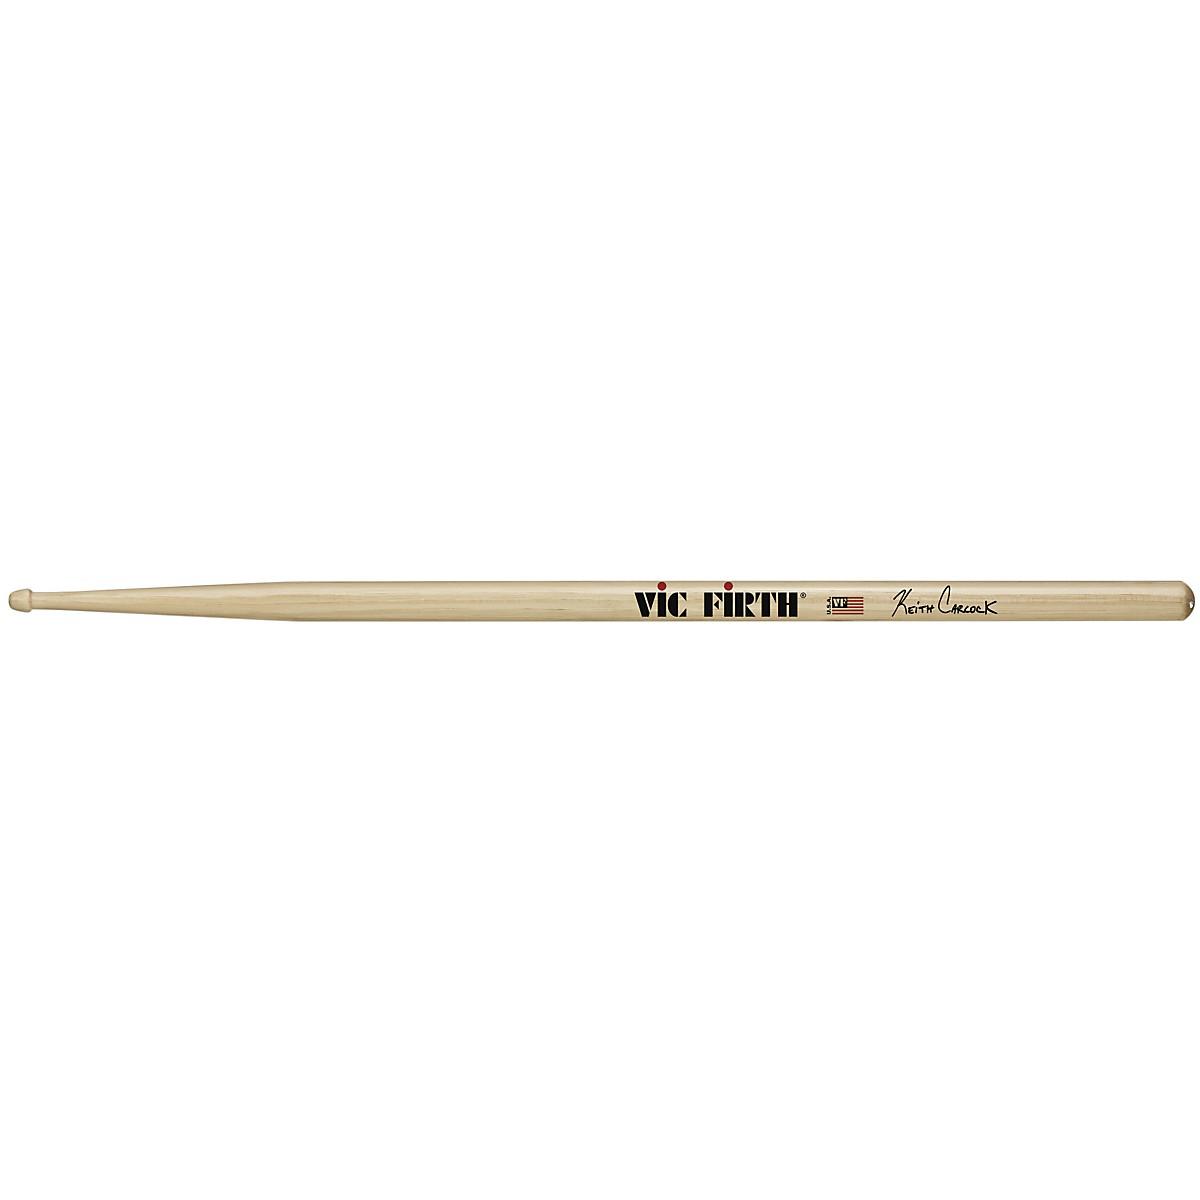 Vic Firth Keith Carlock Signature Drum Sticks